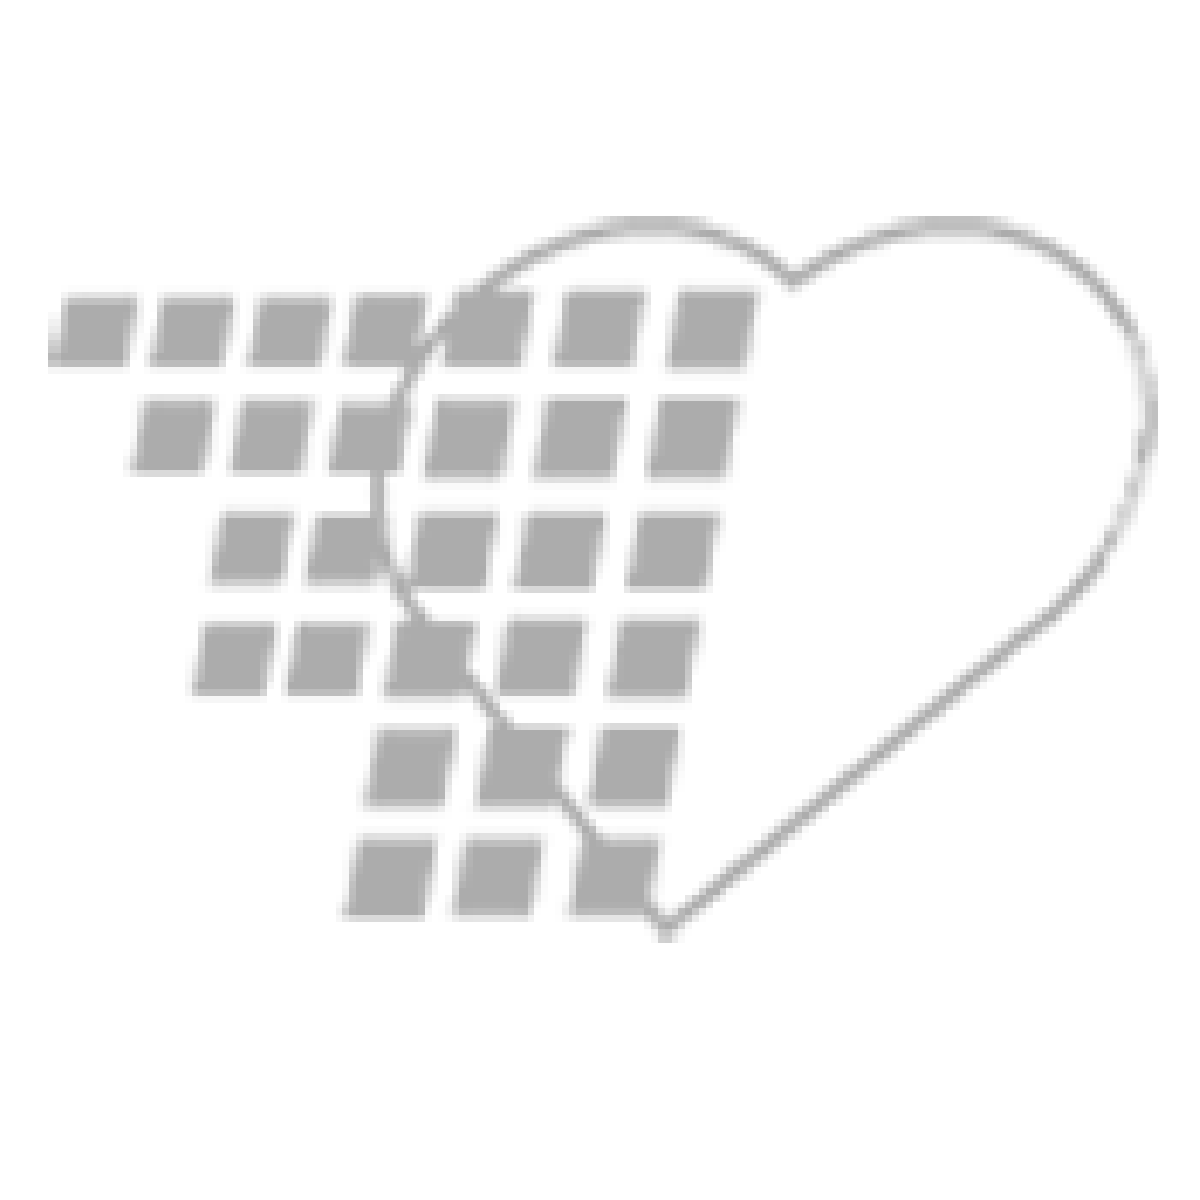 06-93-1435 Demo Dose® Promethazin 25mg/mL Ampule 1mL